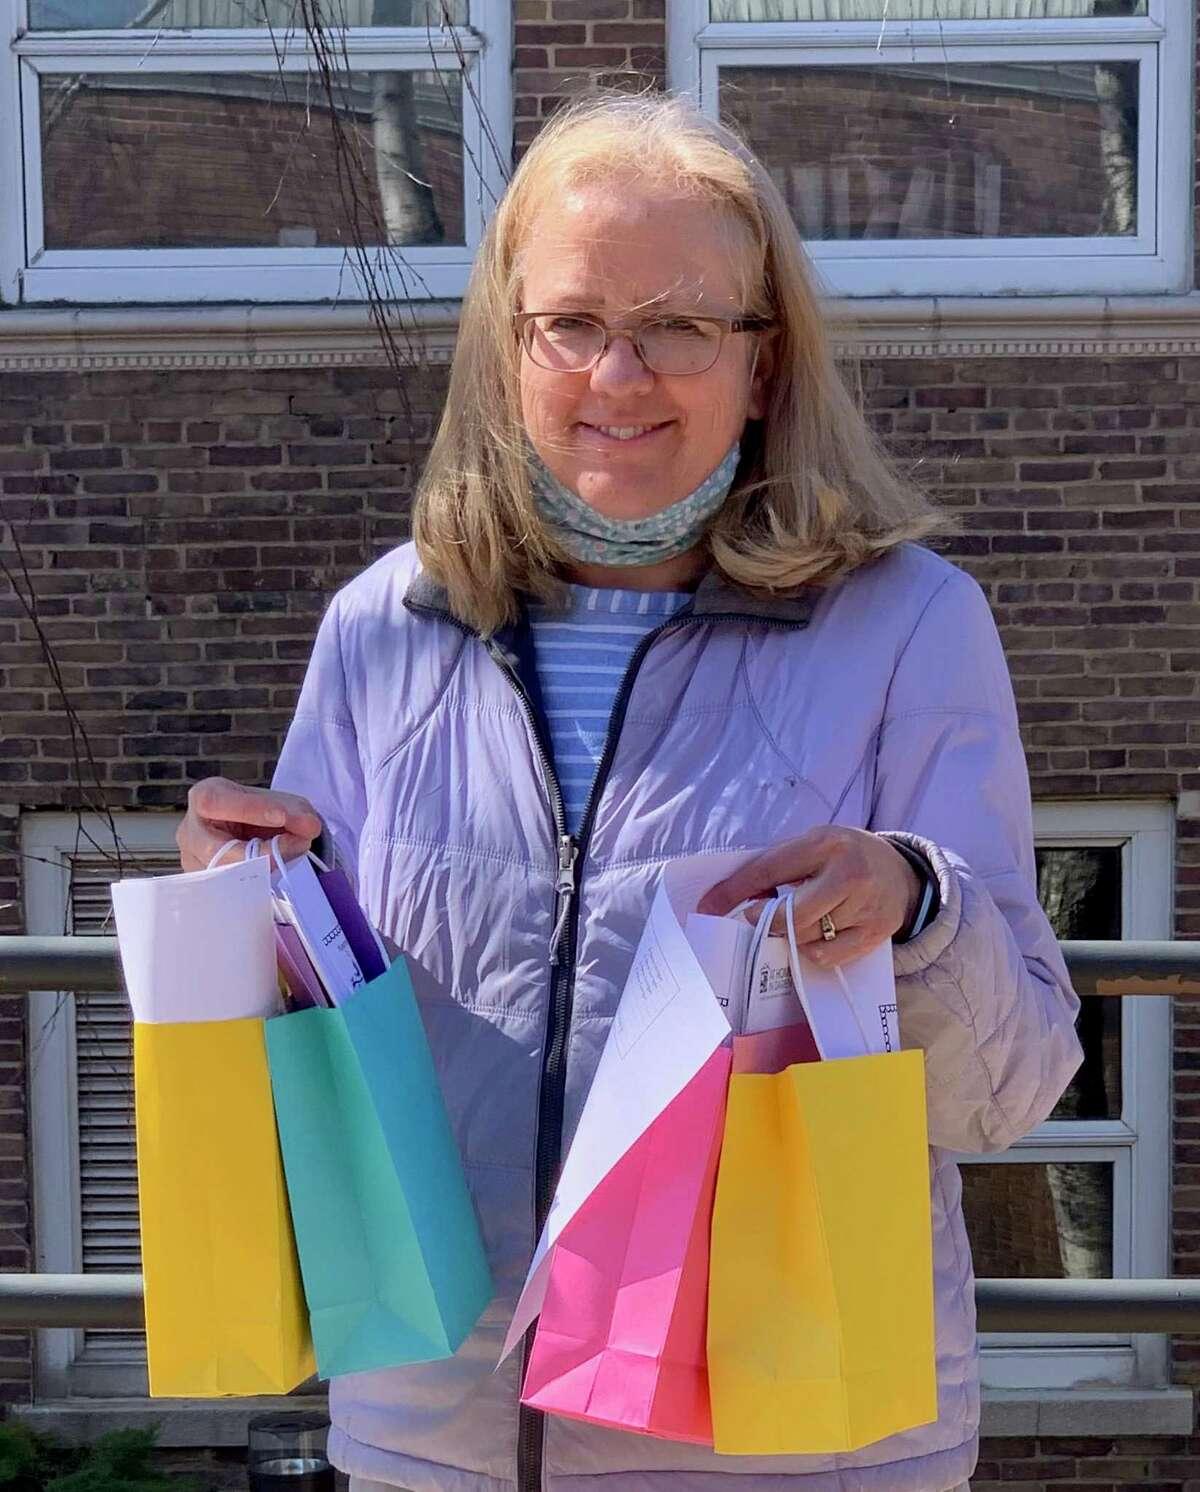 At Home In Darien volunteer Reva Corrigan recently delivered Spring Gift Bags to Darien senior citizens.